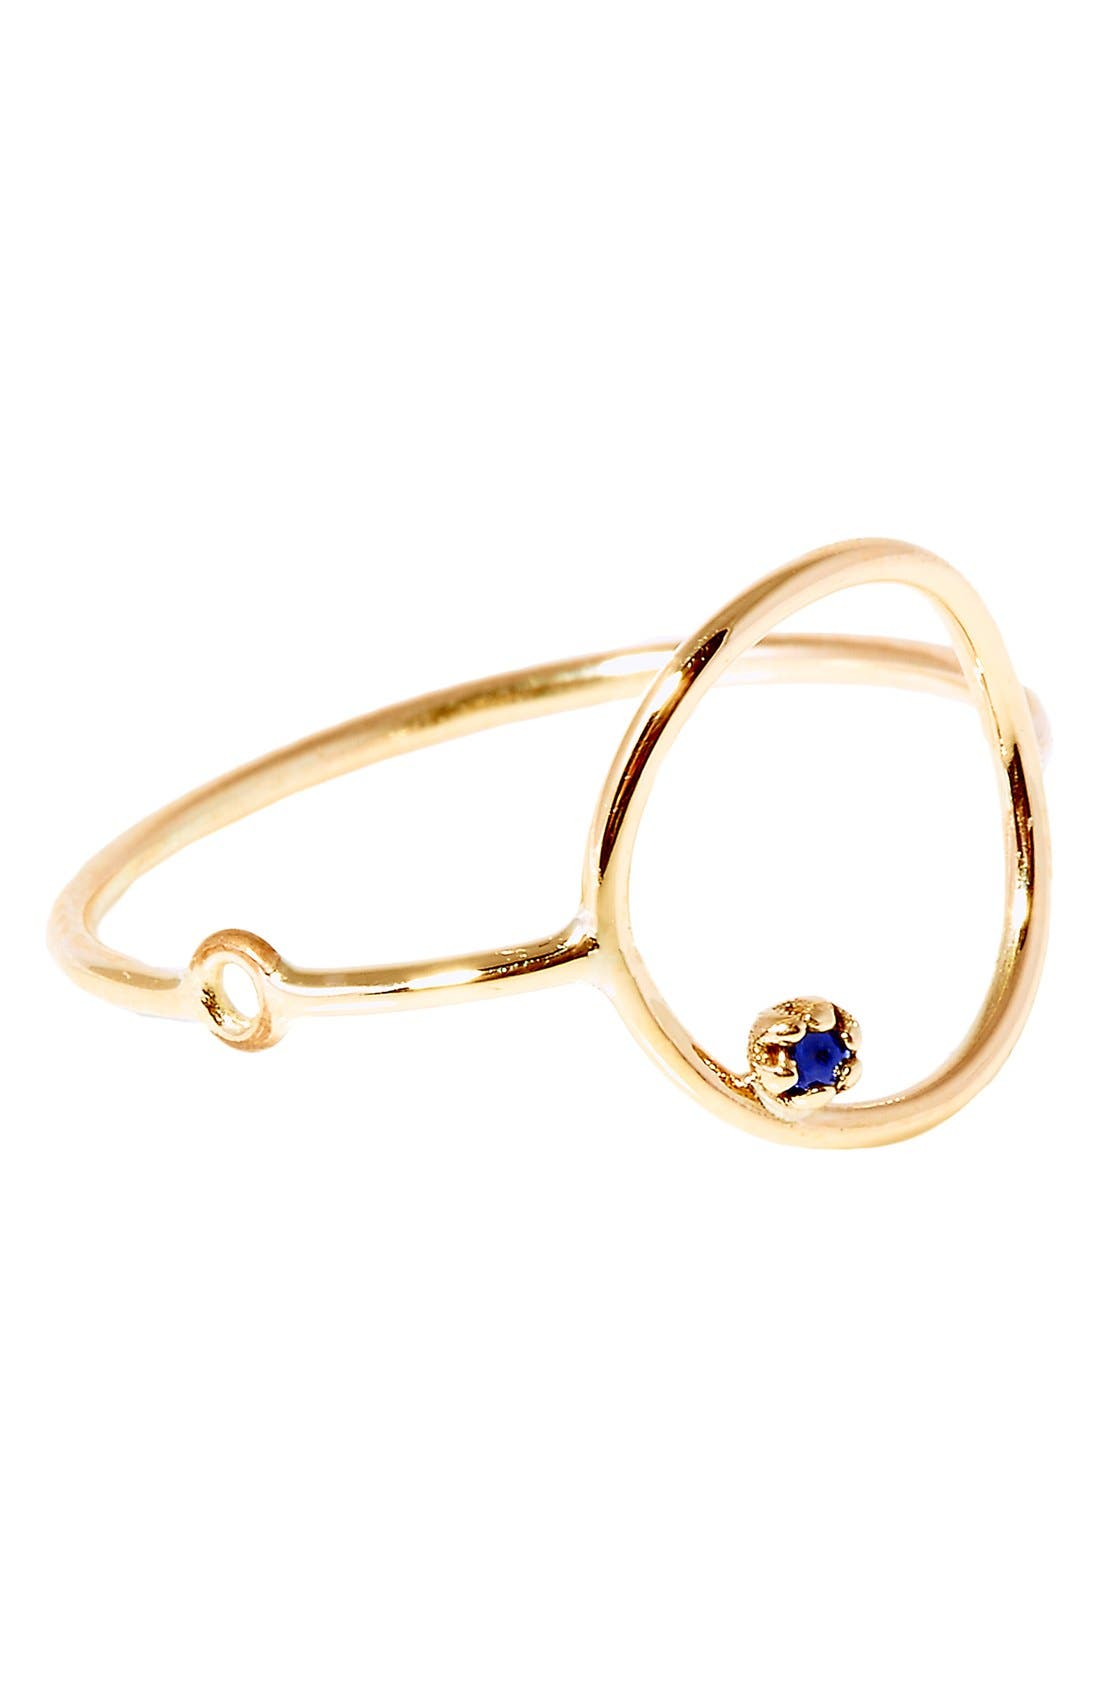 Alternate Image 1 Selected - SARAH & SEBASTIAN 'Stone Bubble' Gold & Sapphire Ring